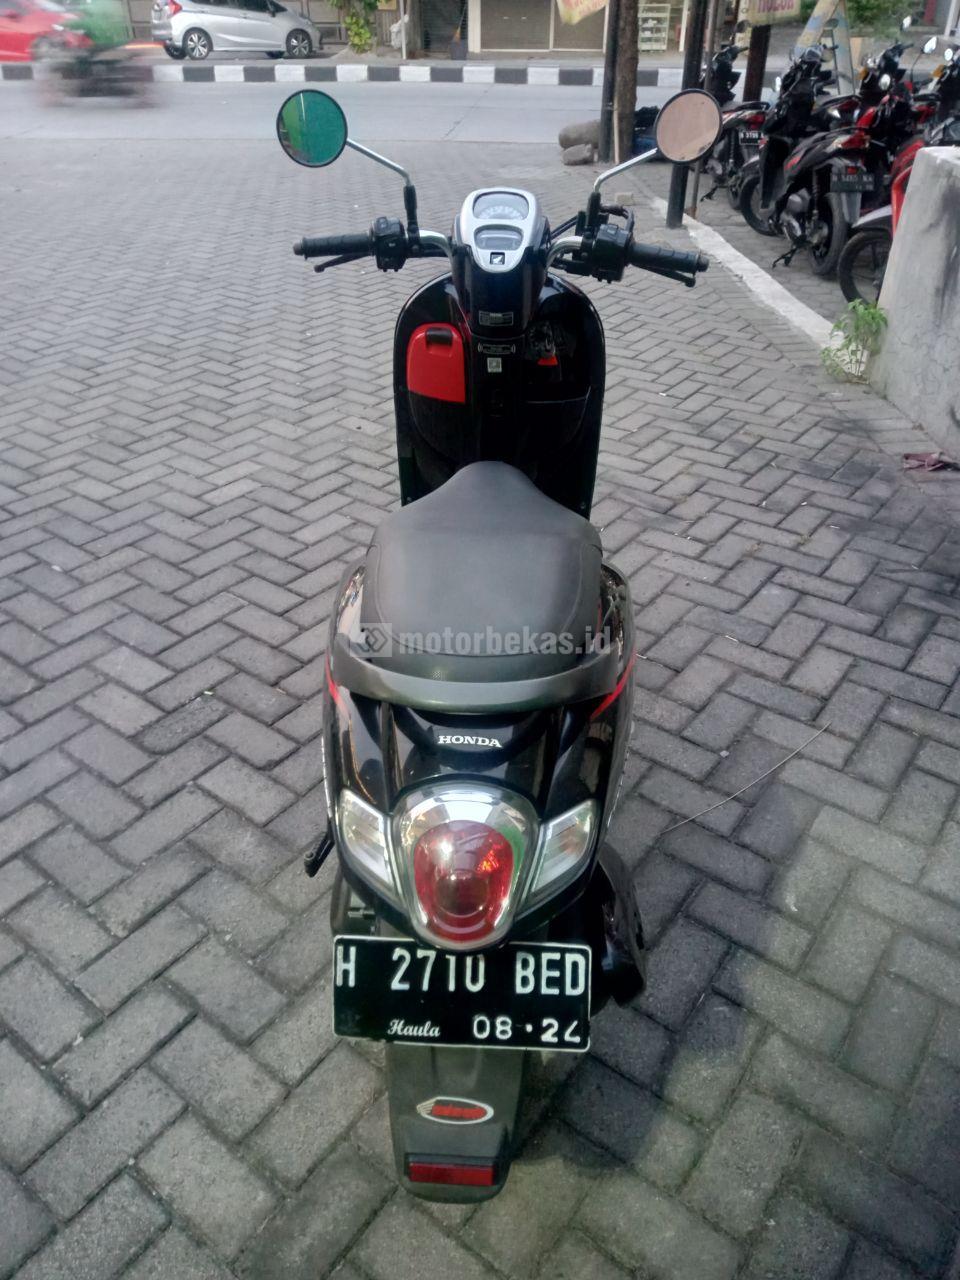 HONDA SCOOPY FI 2202 motorbekas.id